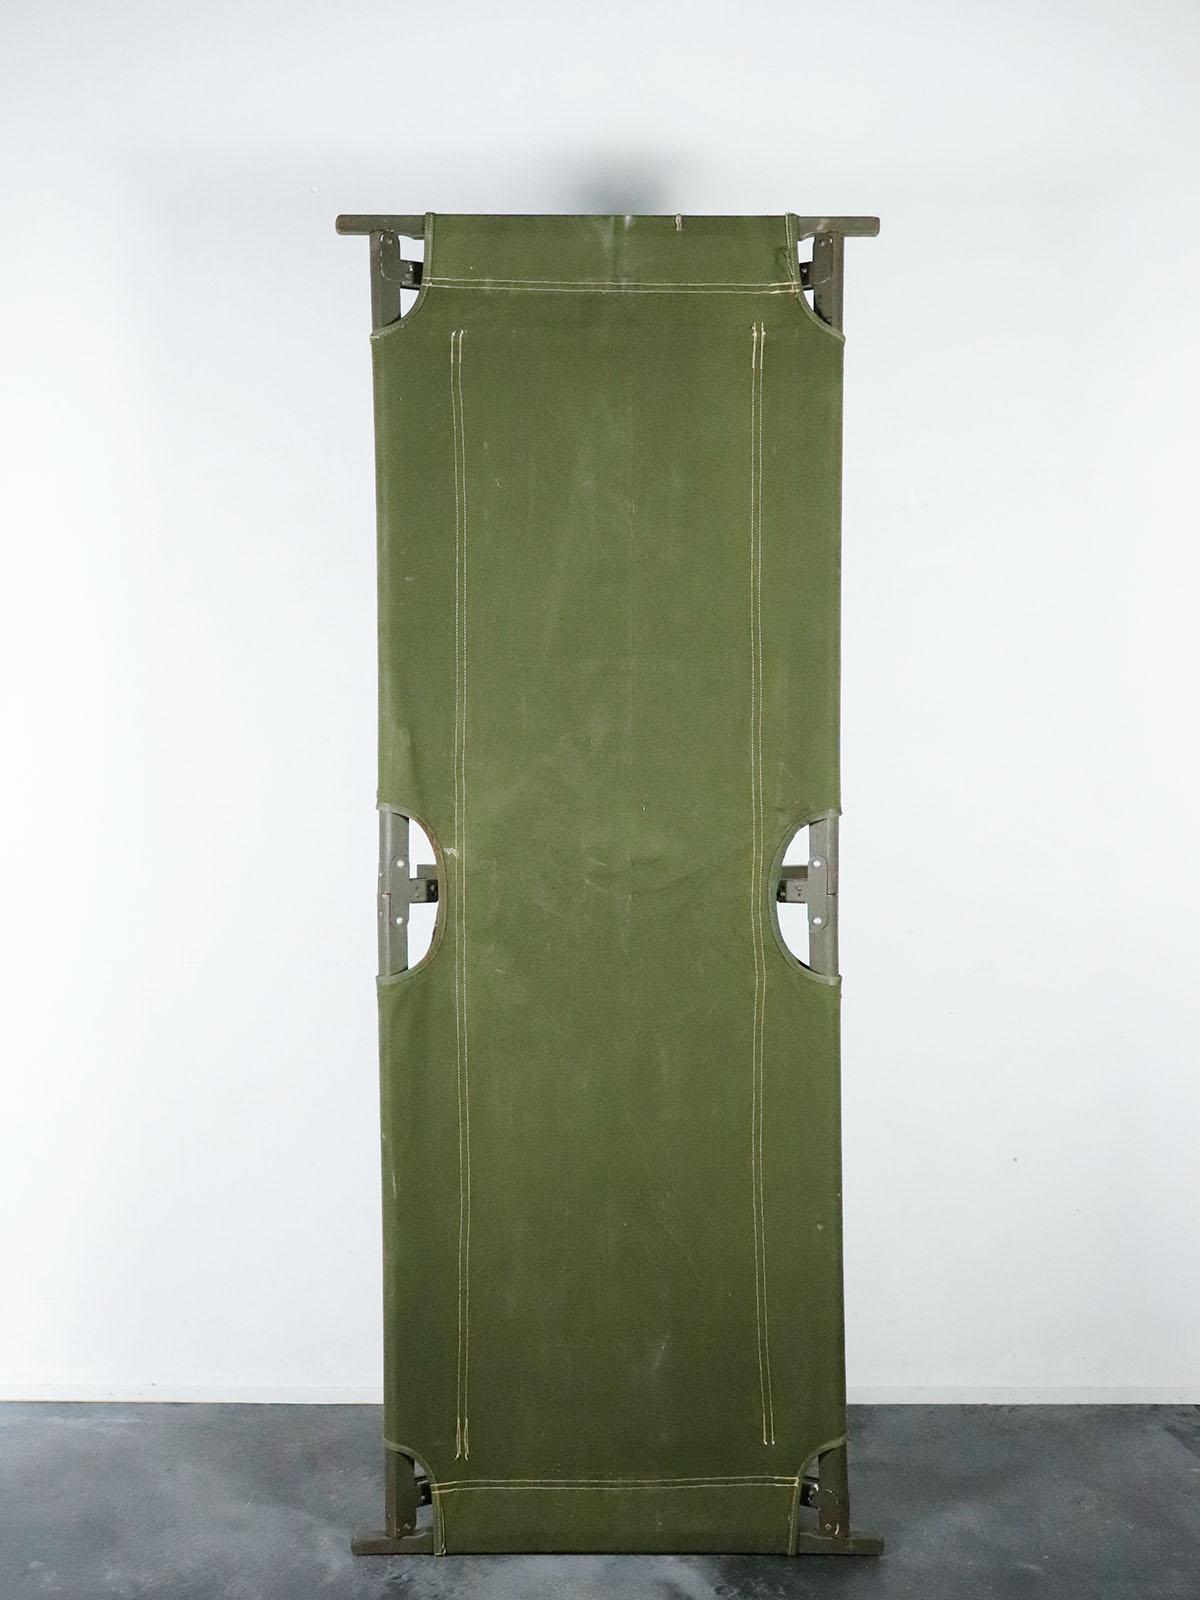 1950's,USM,folding cot,canvas,usa,vintage